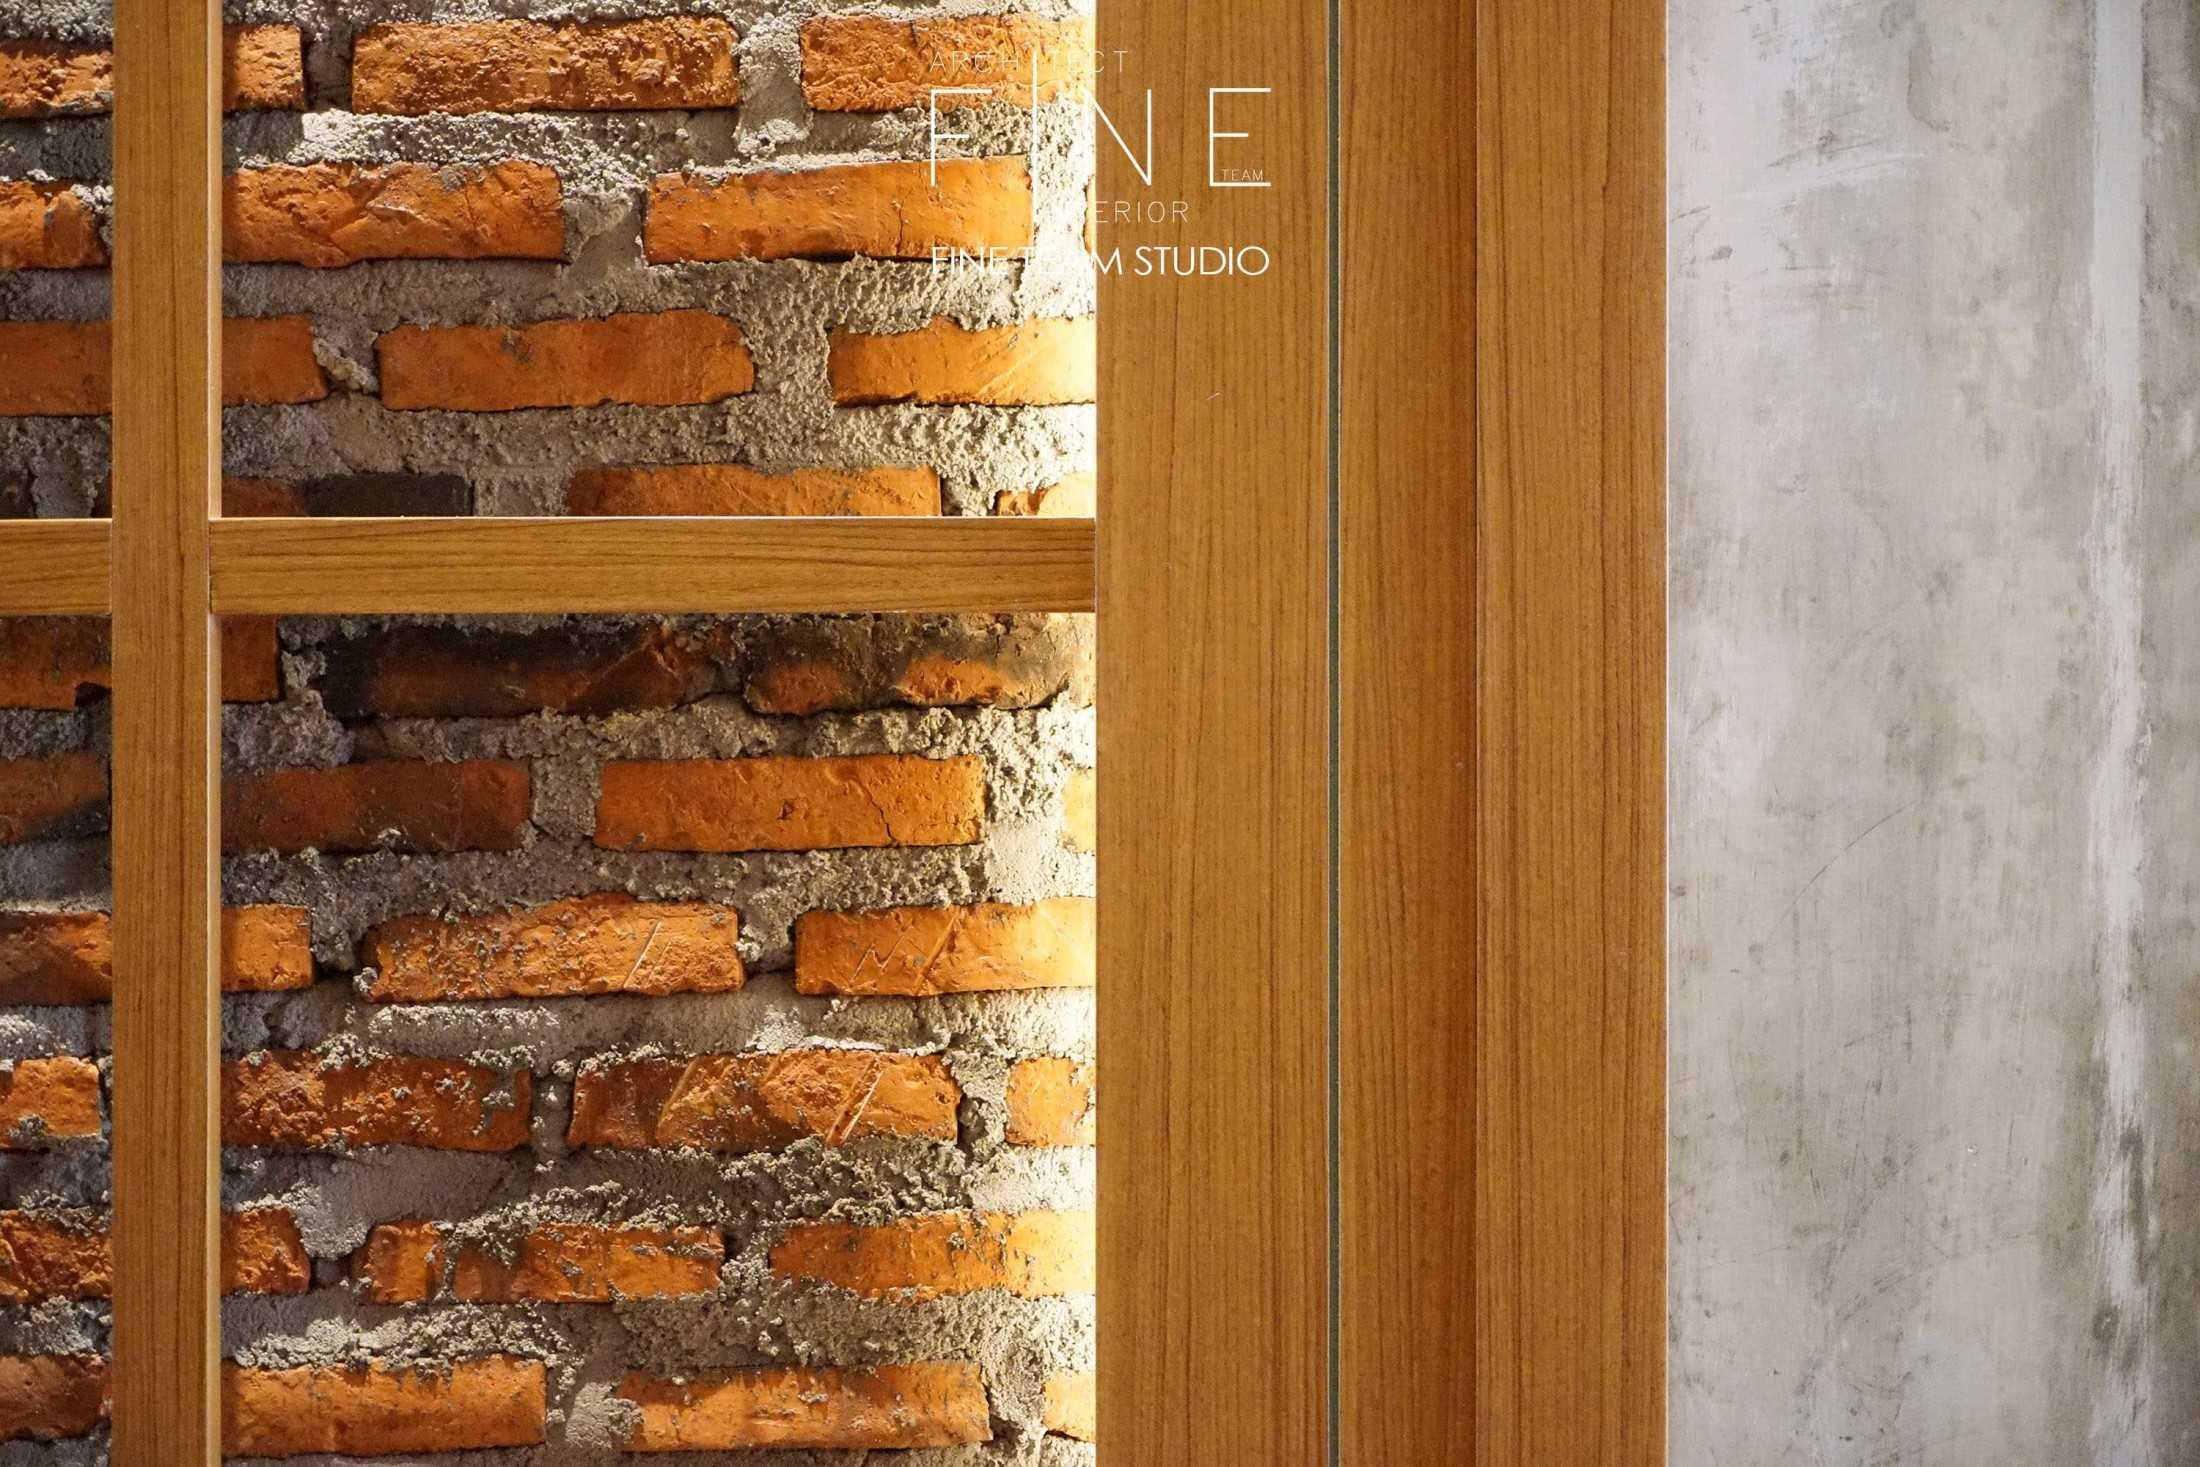 Fine Team Studio Delapan Gram Blok O, Jl. Pluit Karang Bar. No.6 No. 14, Rt.2/rw.8, Pluit, Penjaringan, Jakarta, Daerah Khusus Ibukota Jakarta 14450, Indonesia Blok O, Jl. Pluit Karang Bar. No.6 No. 14, Rt.2/rw.8, Pluit, Penjaringan, Jakarta, Daerah Khusus Ibukota Jakarta 14450, Indonesia Fine-Team-Studio-Delapan-Gram Industrial 56093